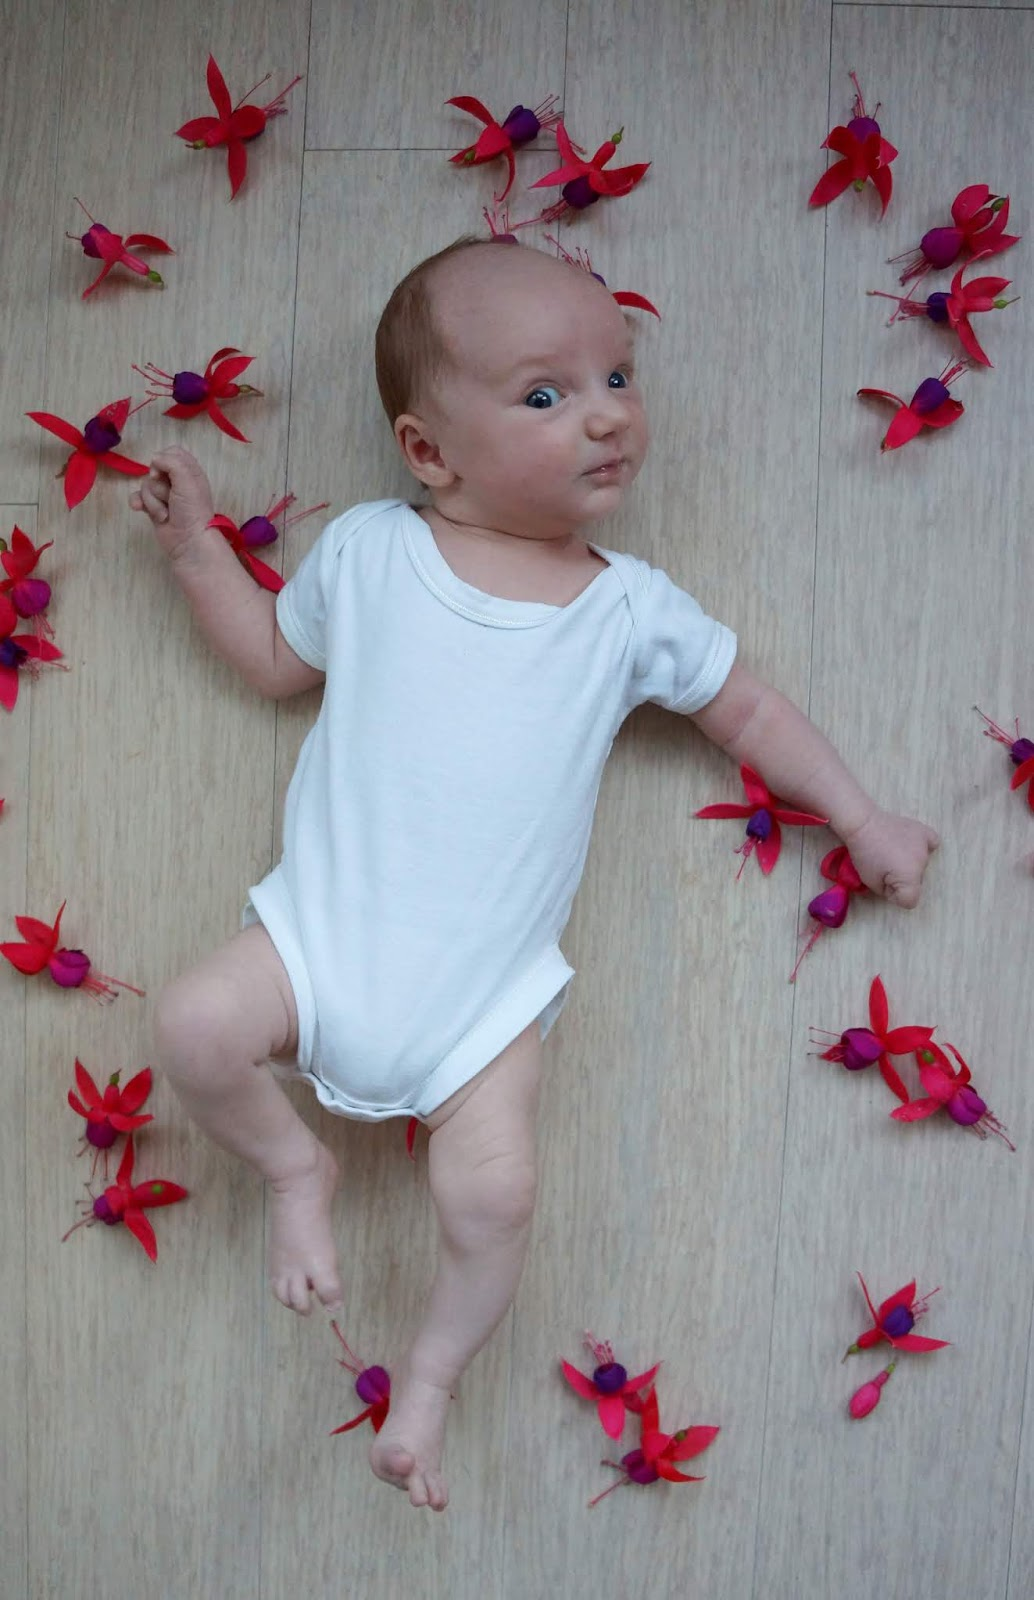 baby portrait amongst flowers